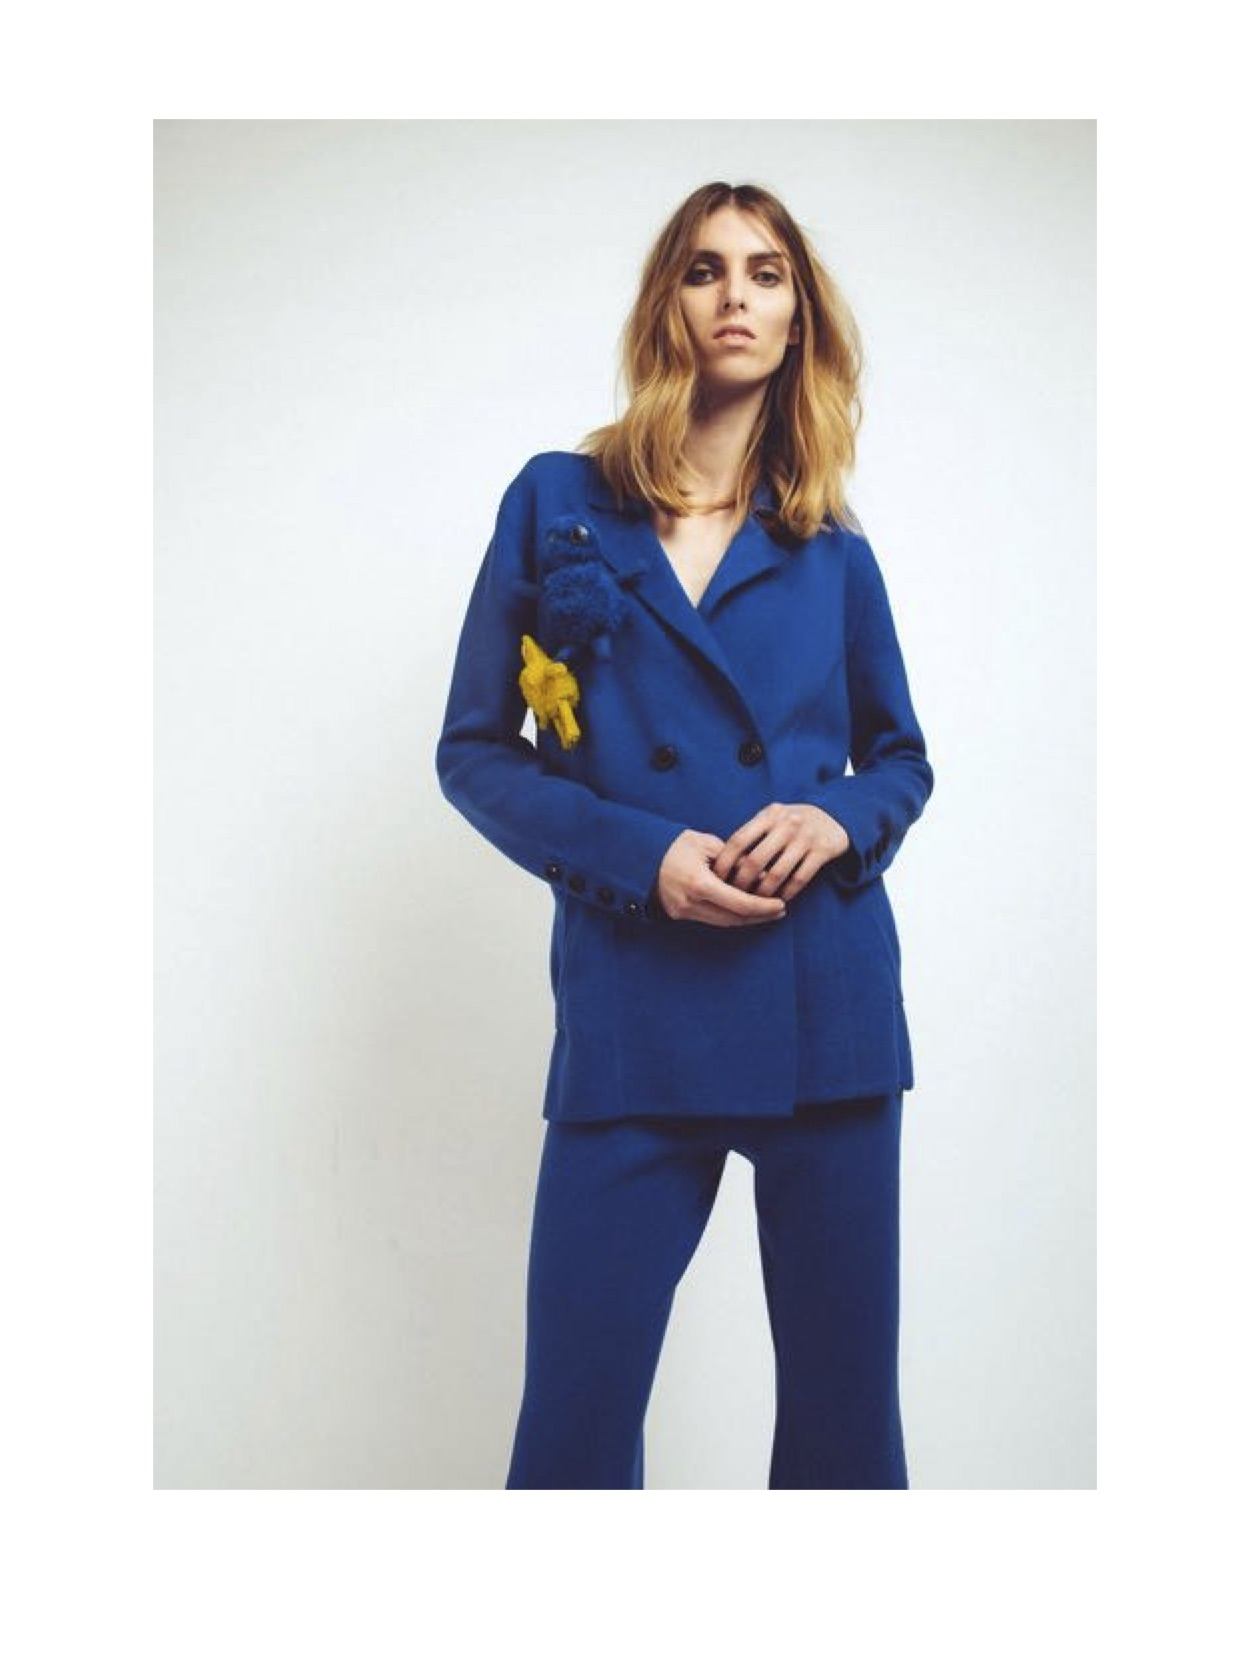 Cashmere suit in blue